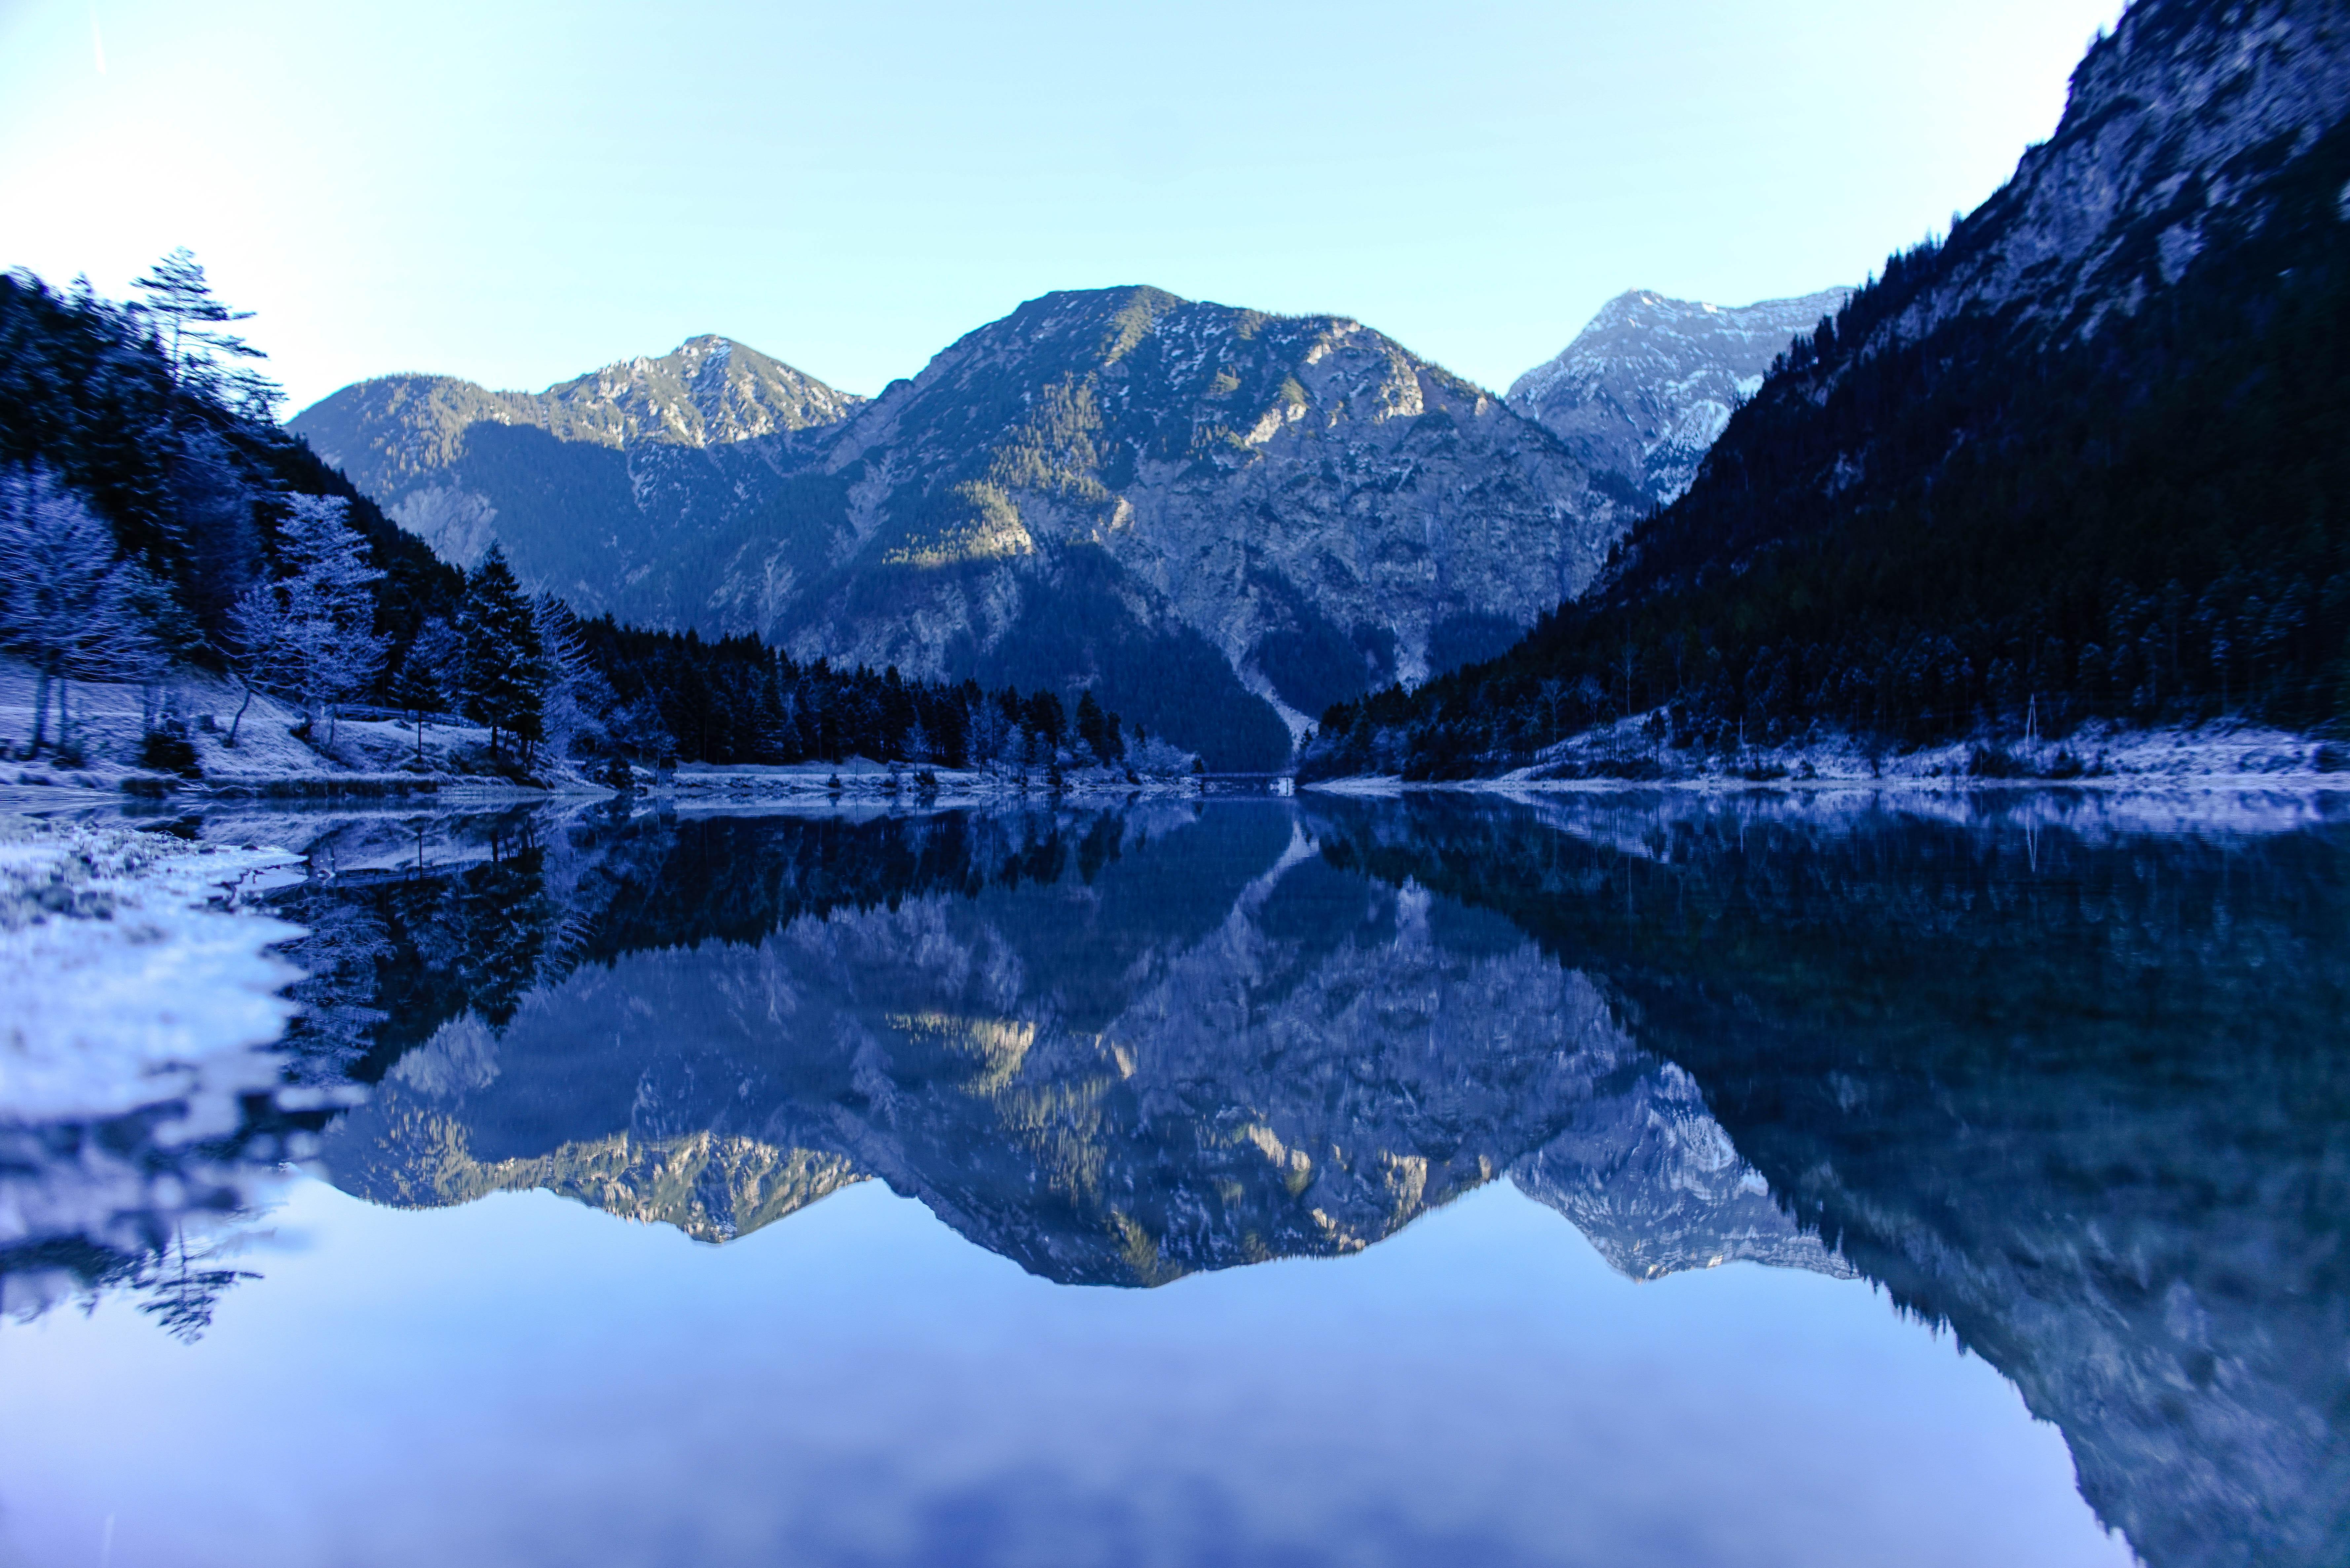 Lake and Green Mountain